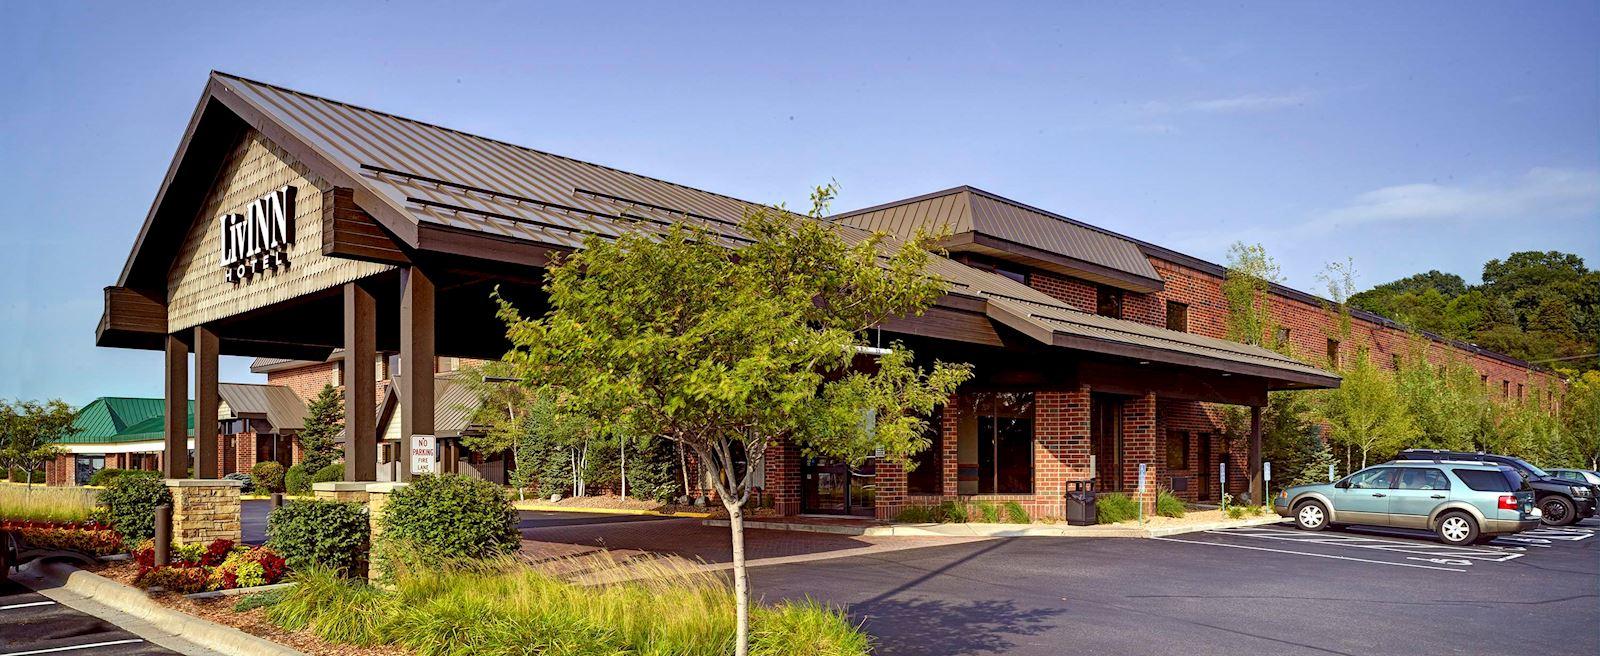 LivINN Hotels Minneapolis, Minnesota